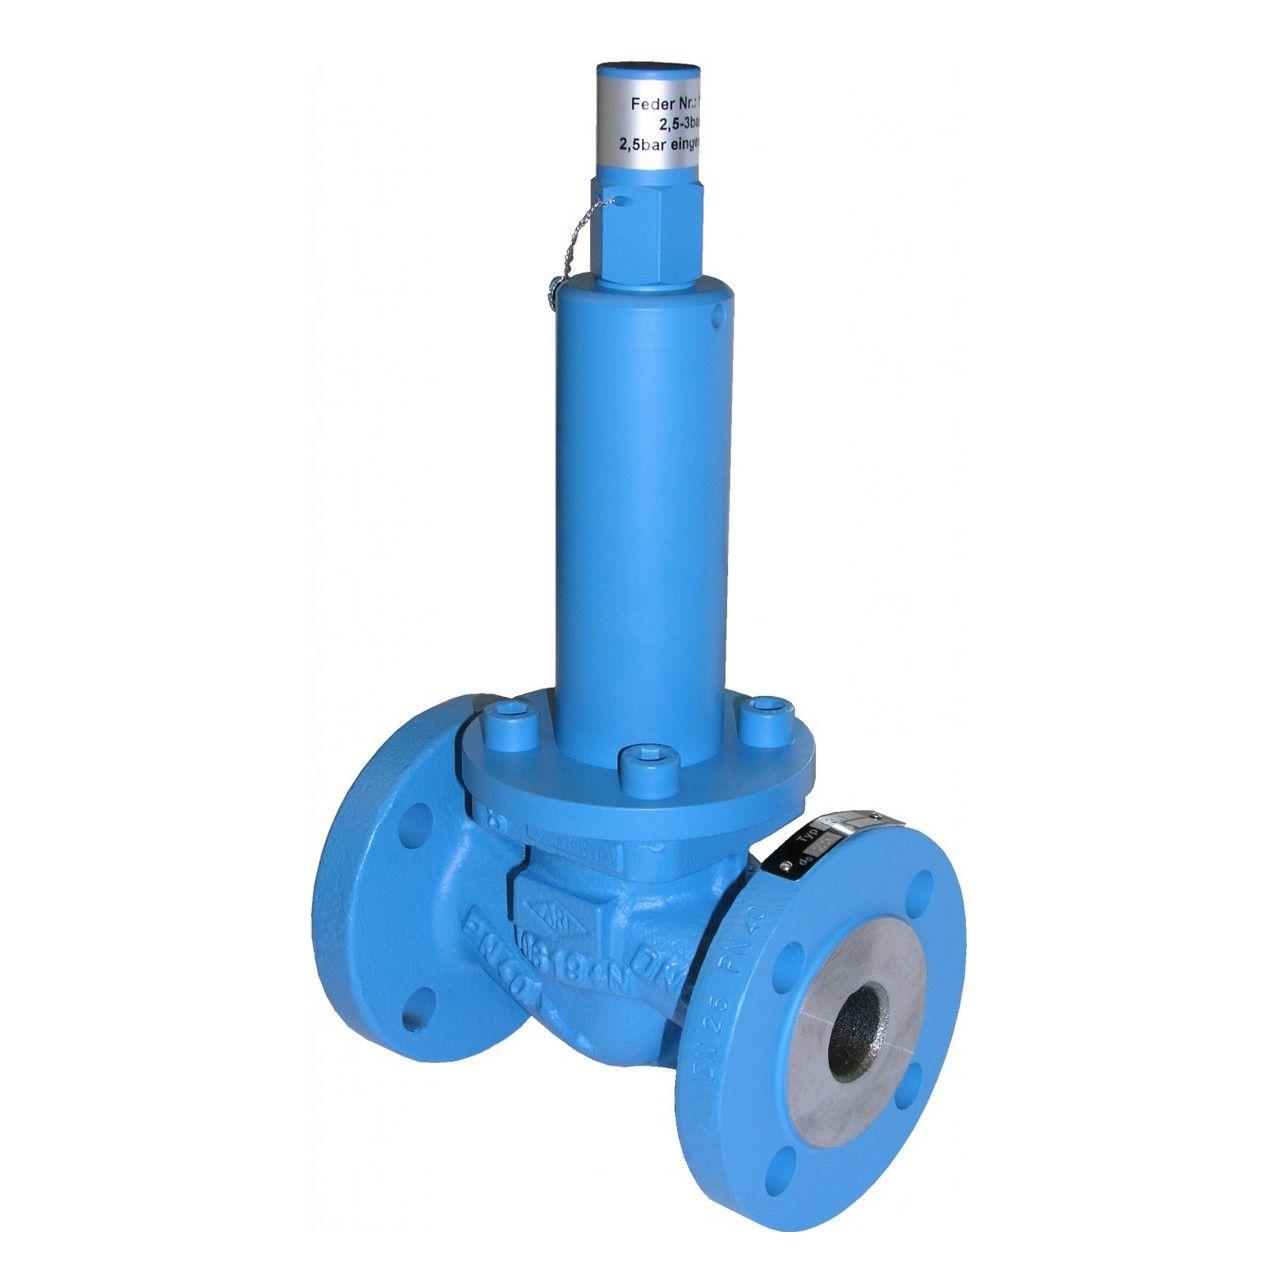 Niezgodka type 13 straight pattern relief valve relief